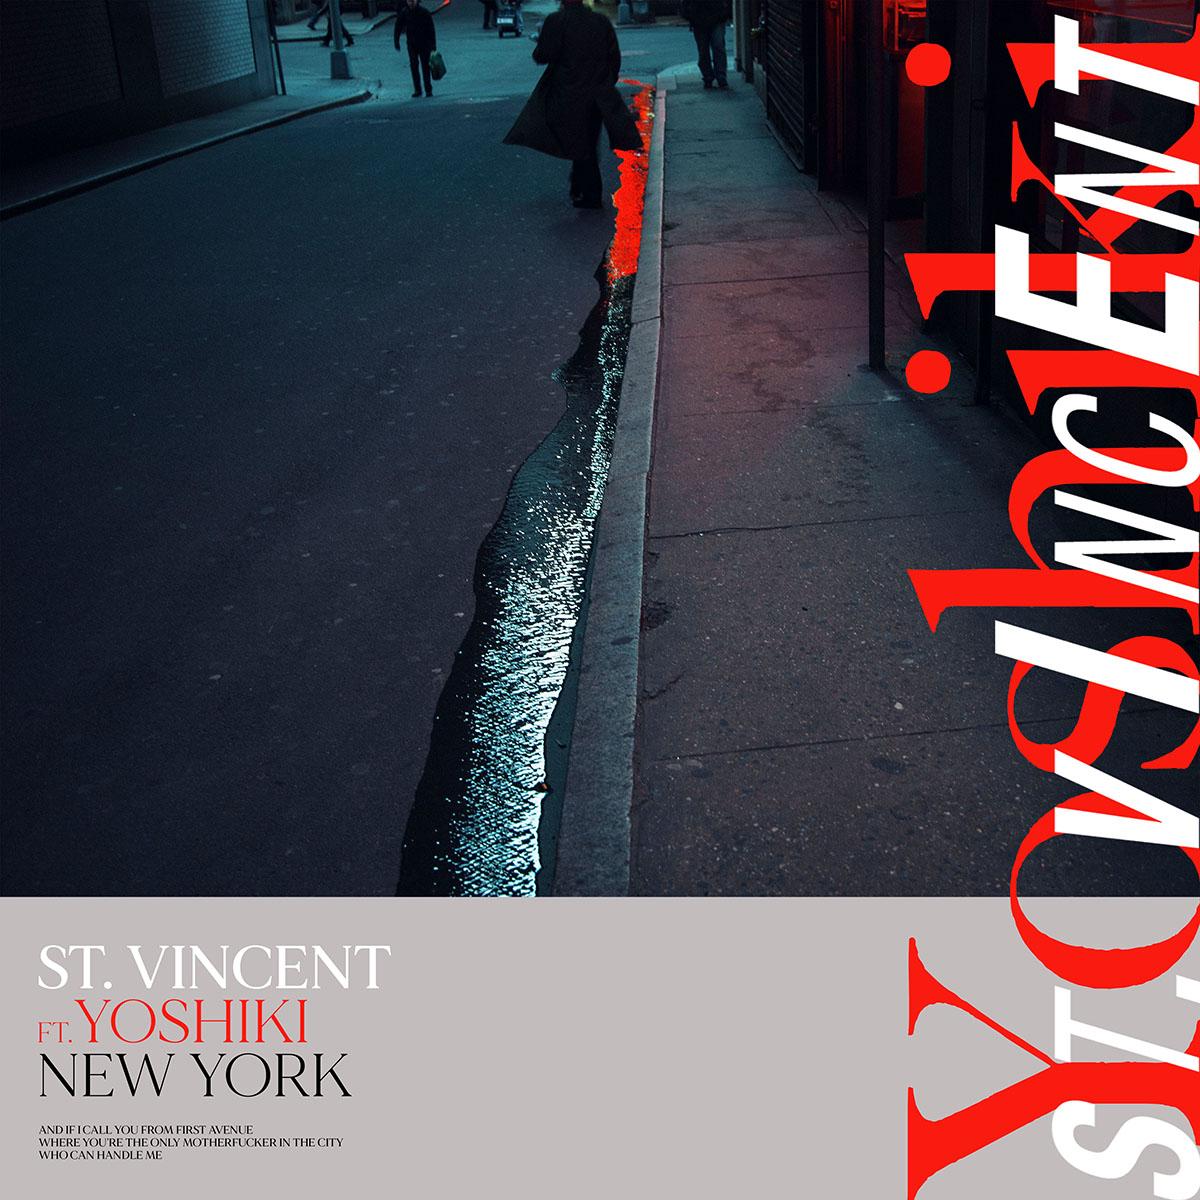 St. Vincent Yoshiki New York